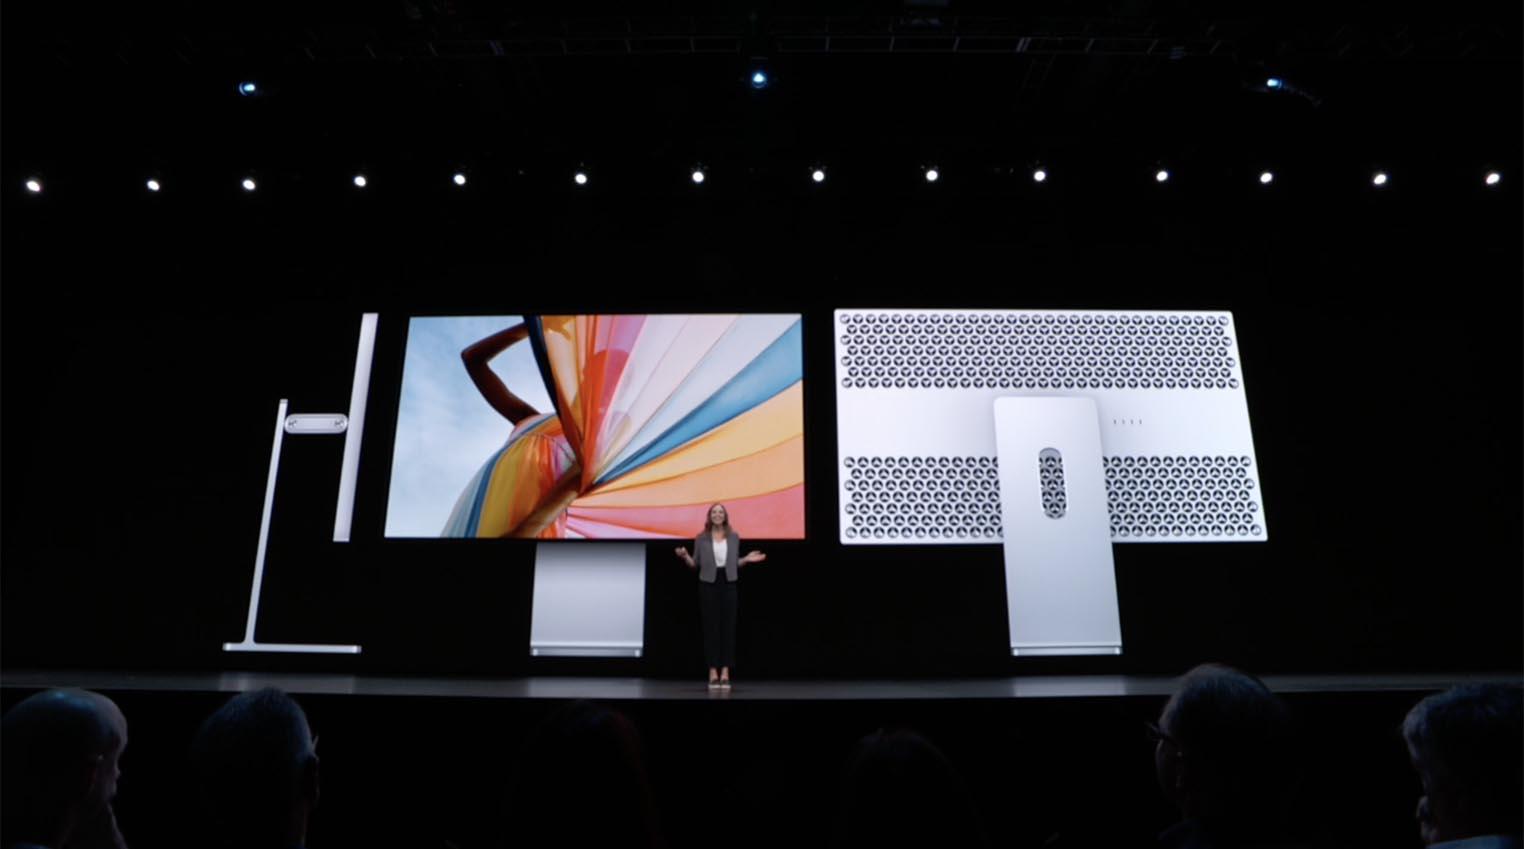 Pro Display XDR keynote